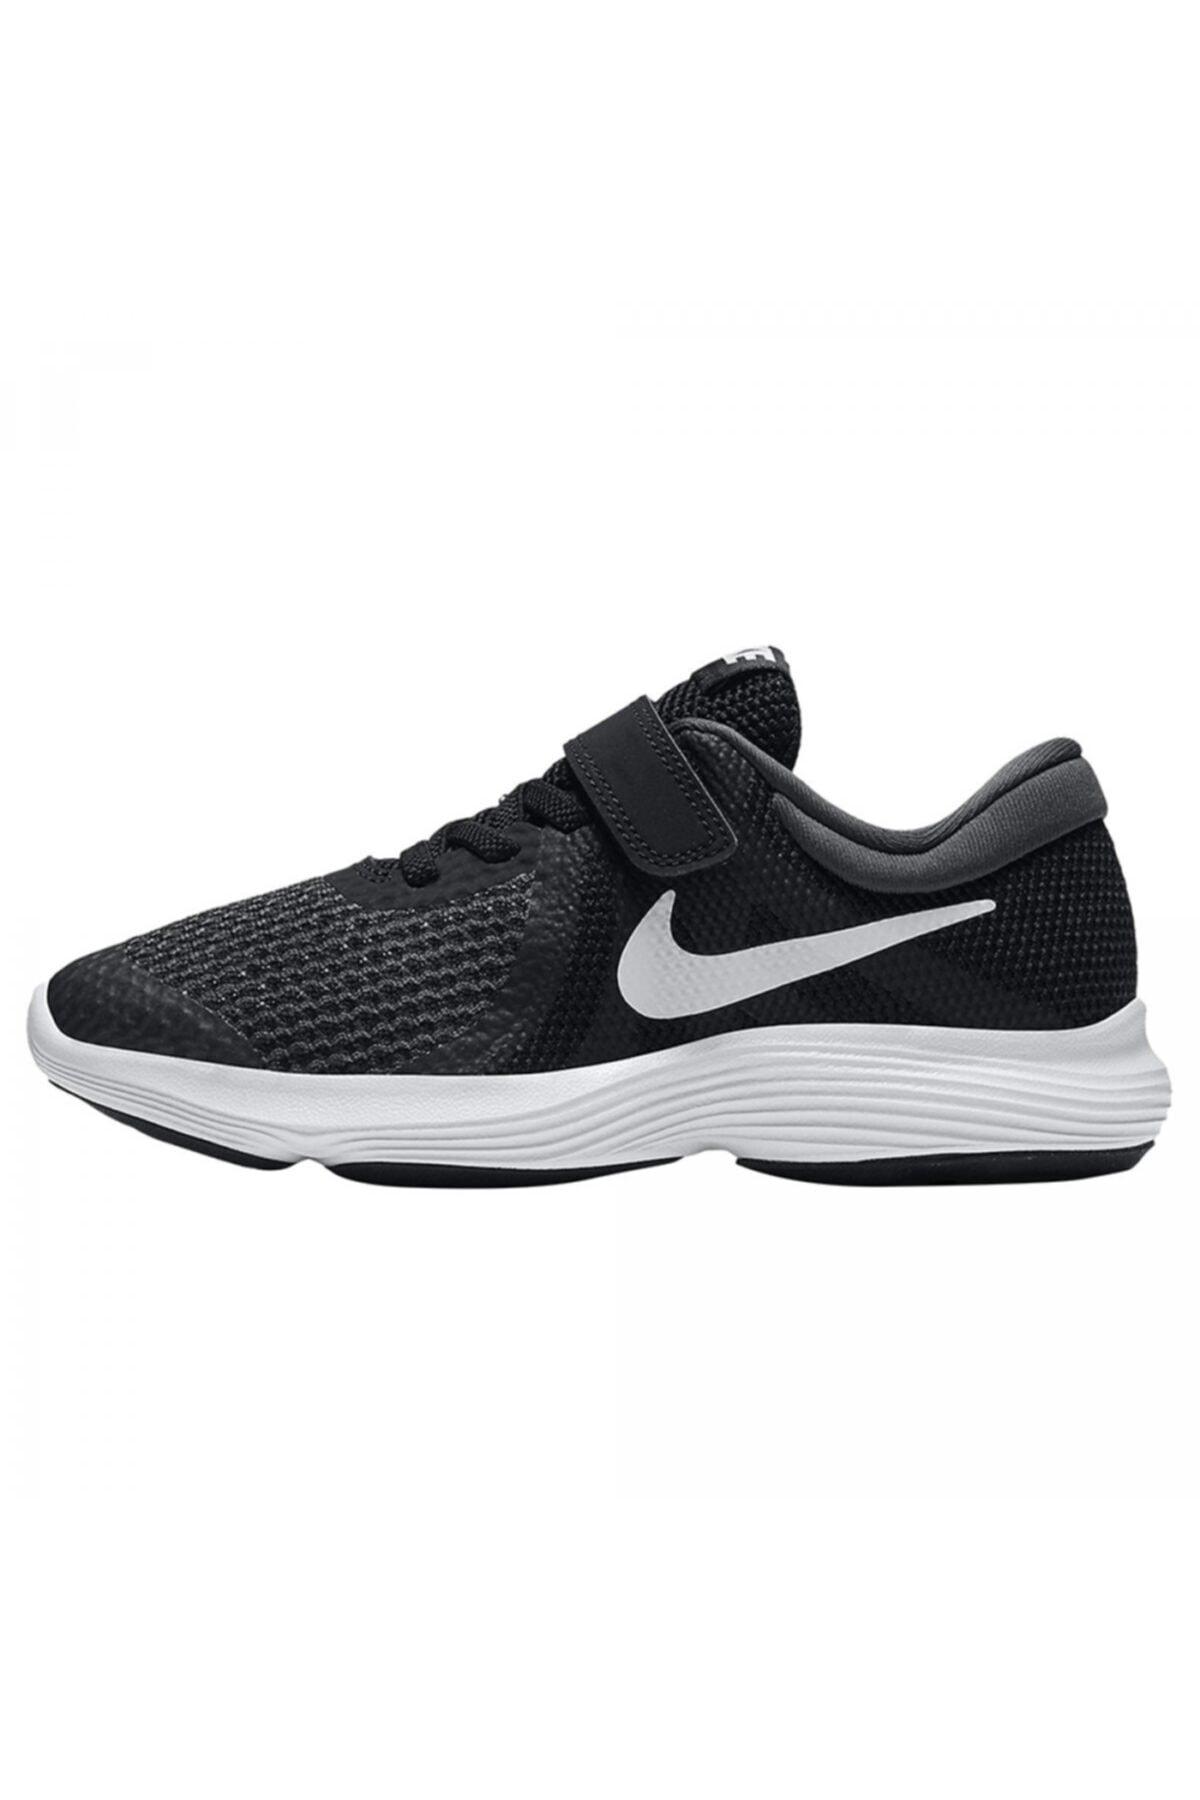 Nike Kids Bebek Siyah Koşu Ayakkabı 943305-006 1